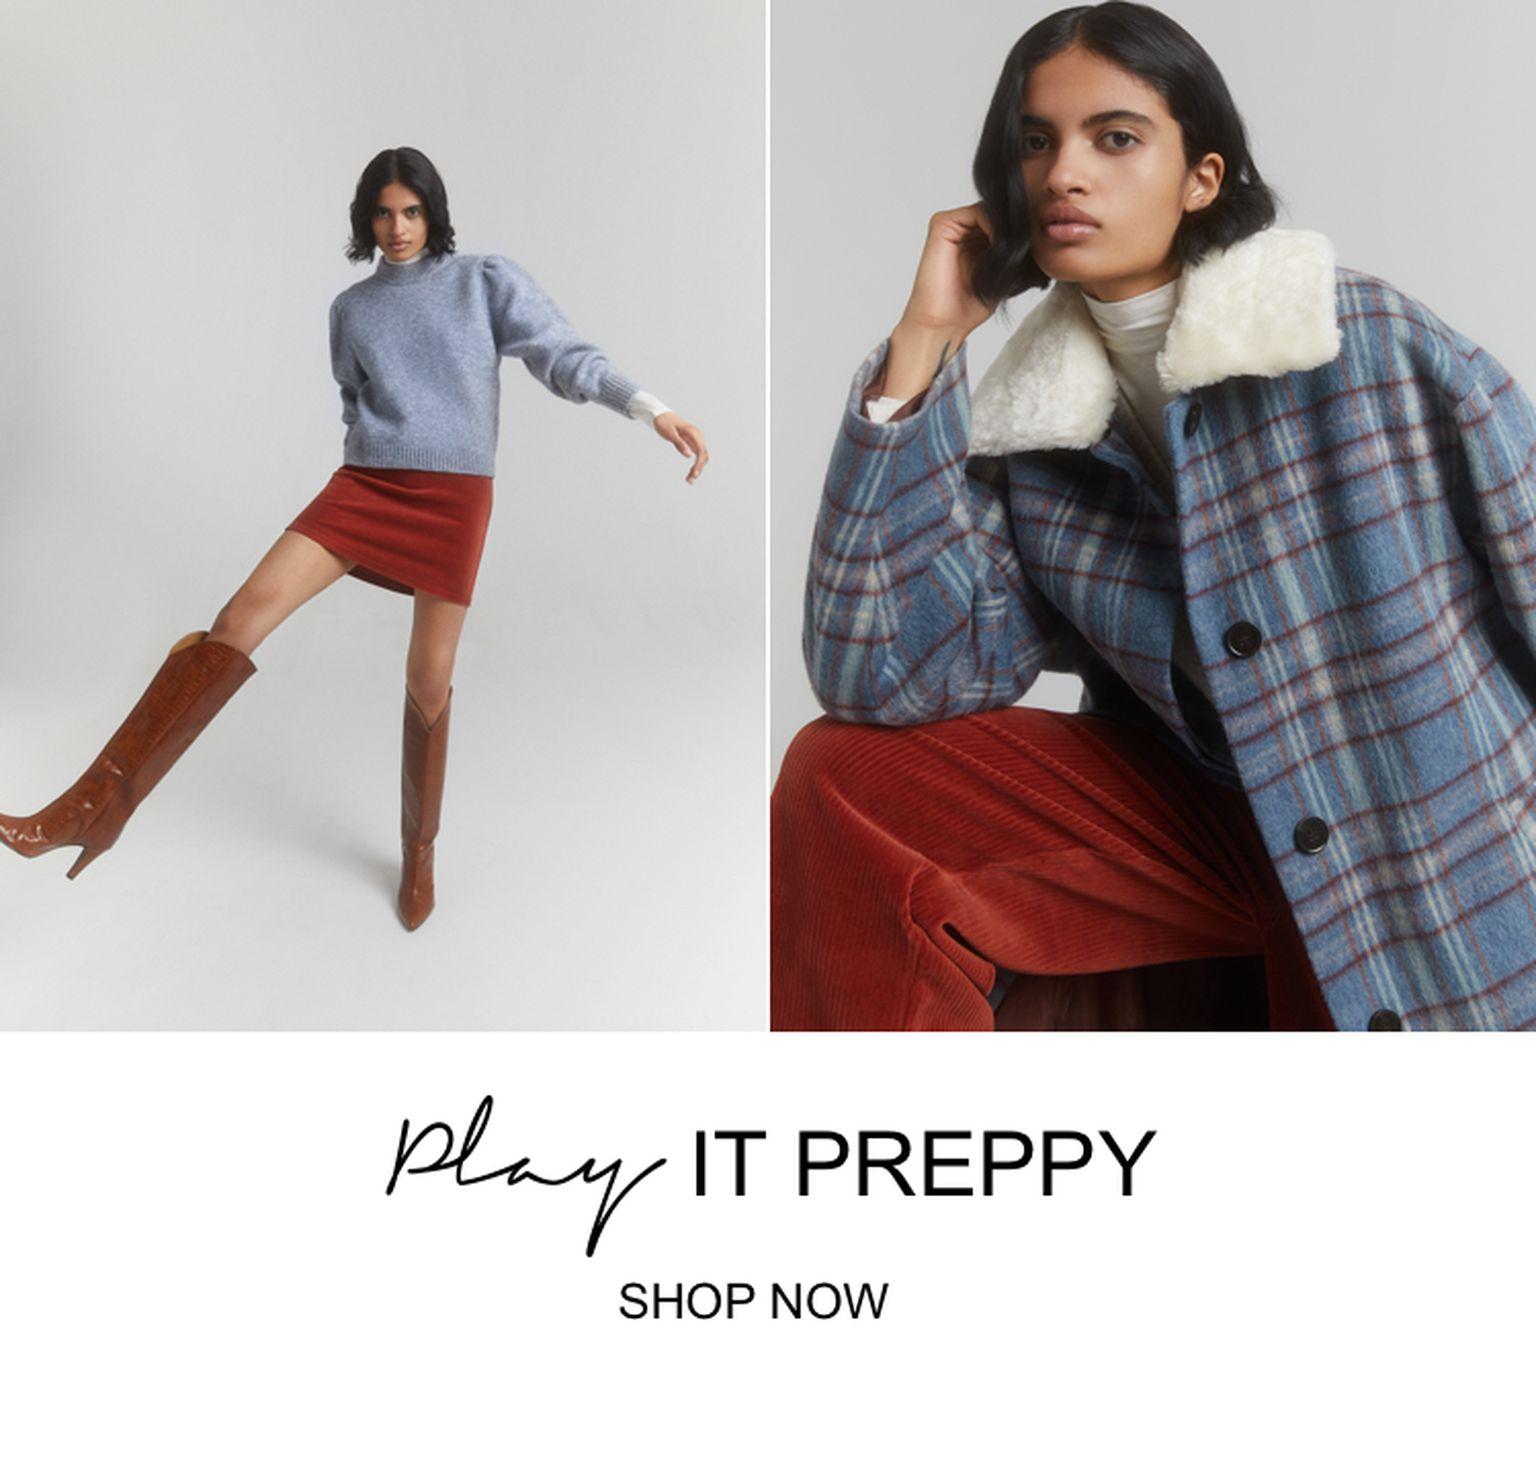 play it preppy